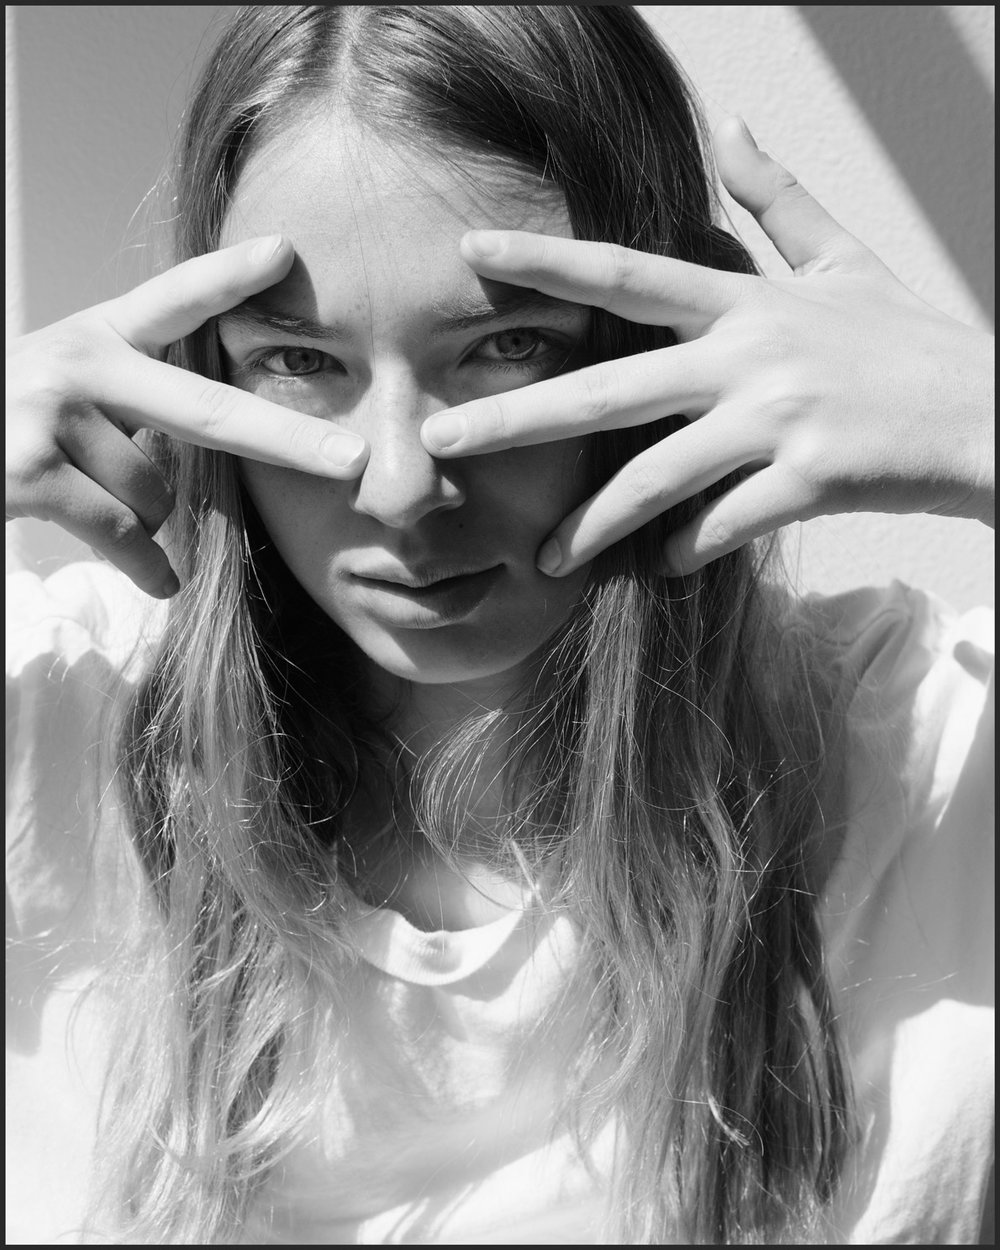 Nick_Sabatalo_Fashion_Photography_Inspirational_Artist_Newsletter_Motivational_Quote_Peronal_Development_Exercise_Bronte_Schleppi_Photogenics_LA_Models-05.jpg